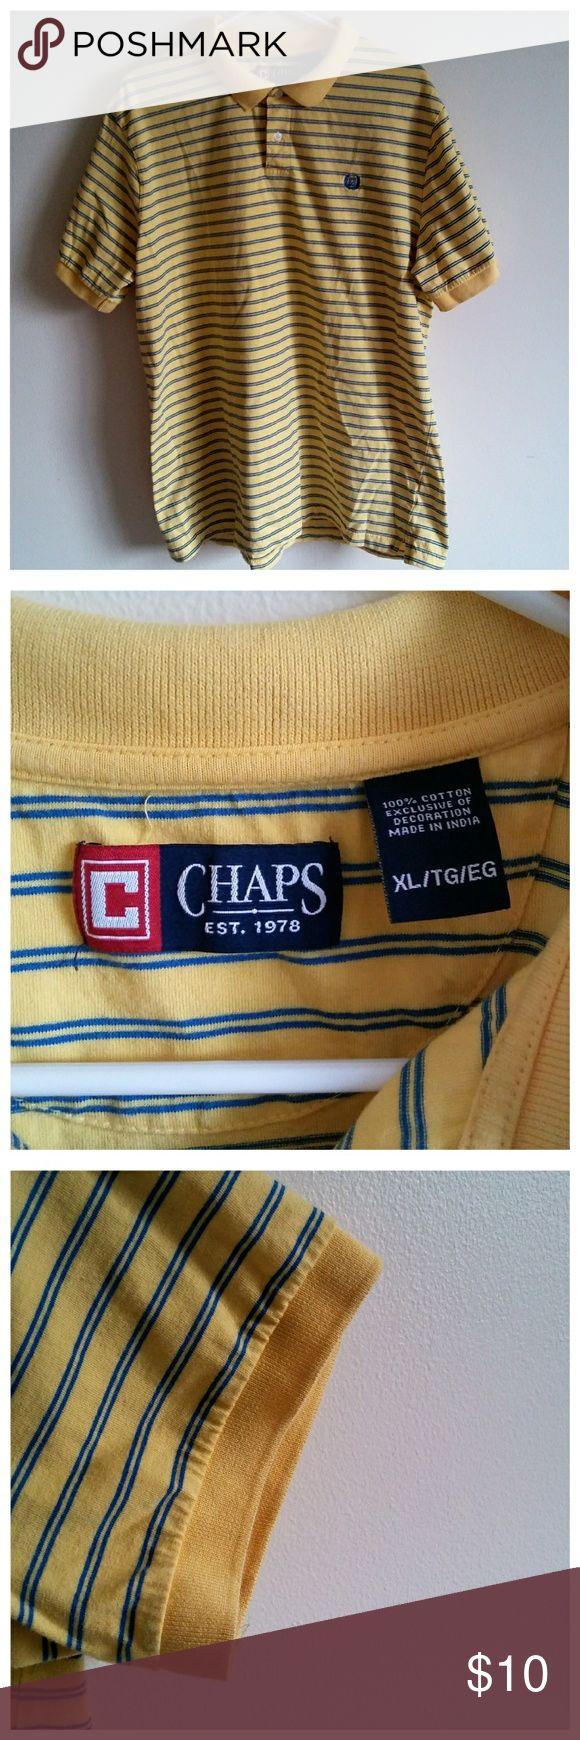 Chaps shirt Casual men's shirt Chaps Shirts Tees - Short Sleeve